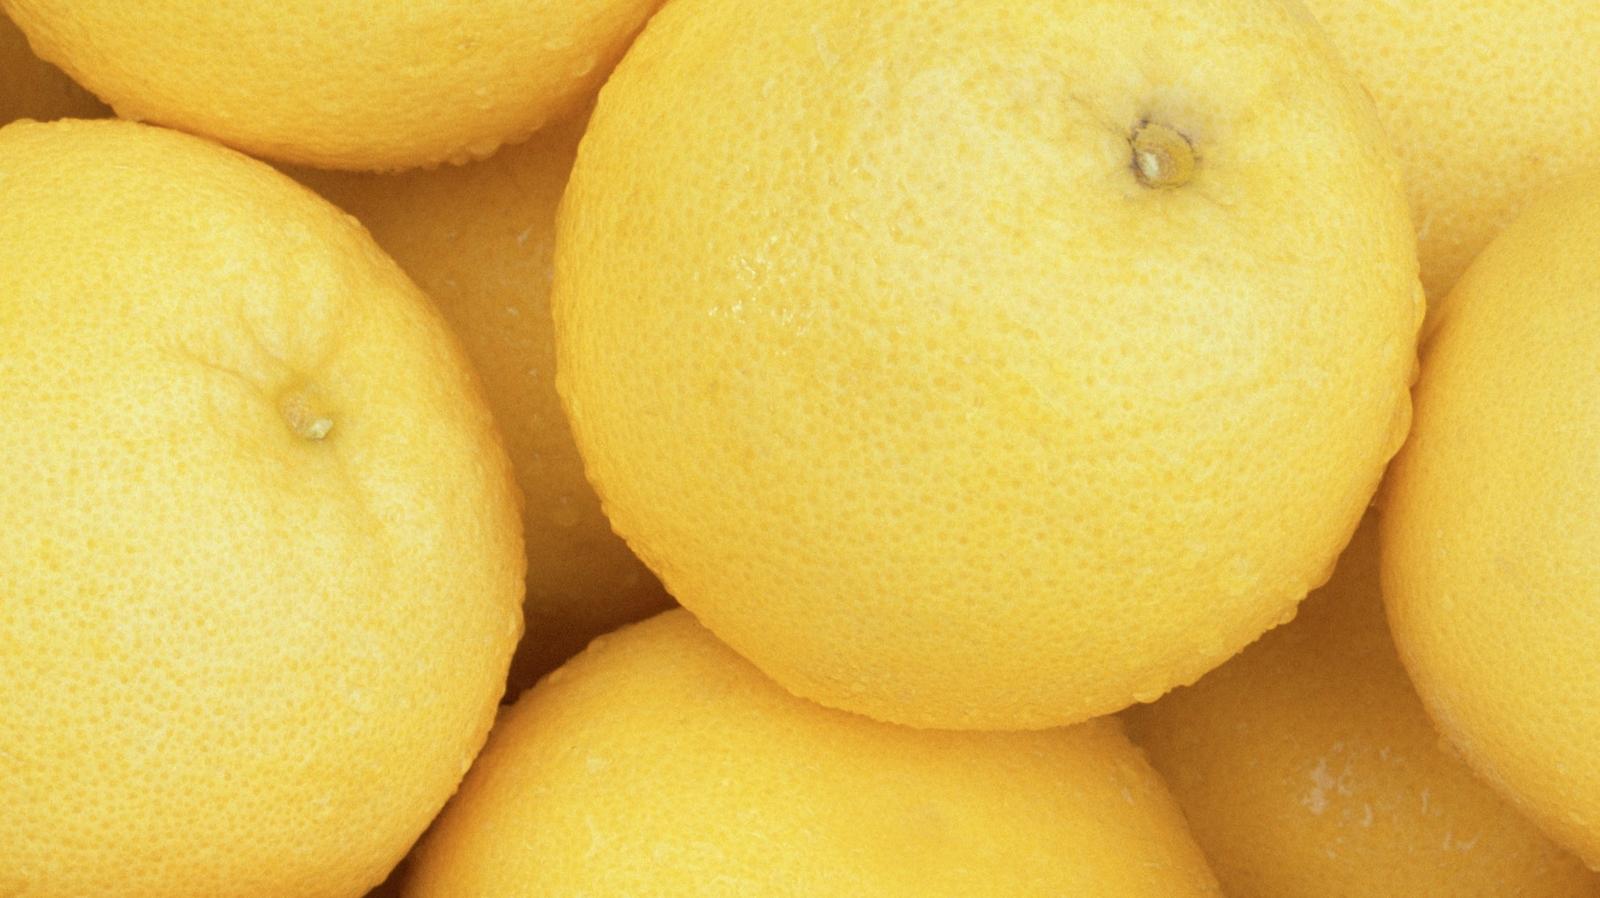 Citrus Crop Nutrition